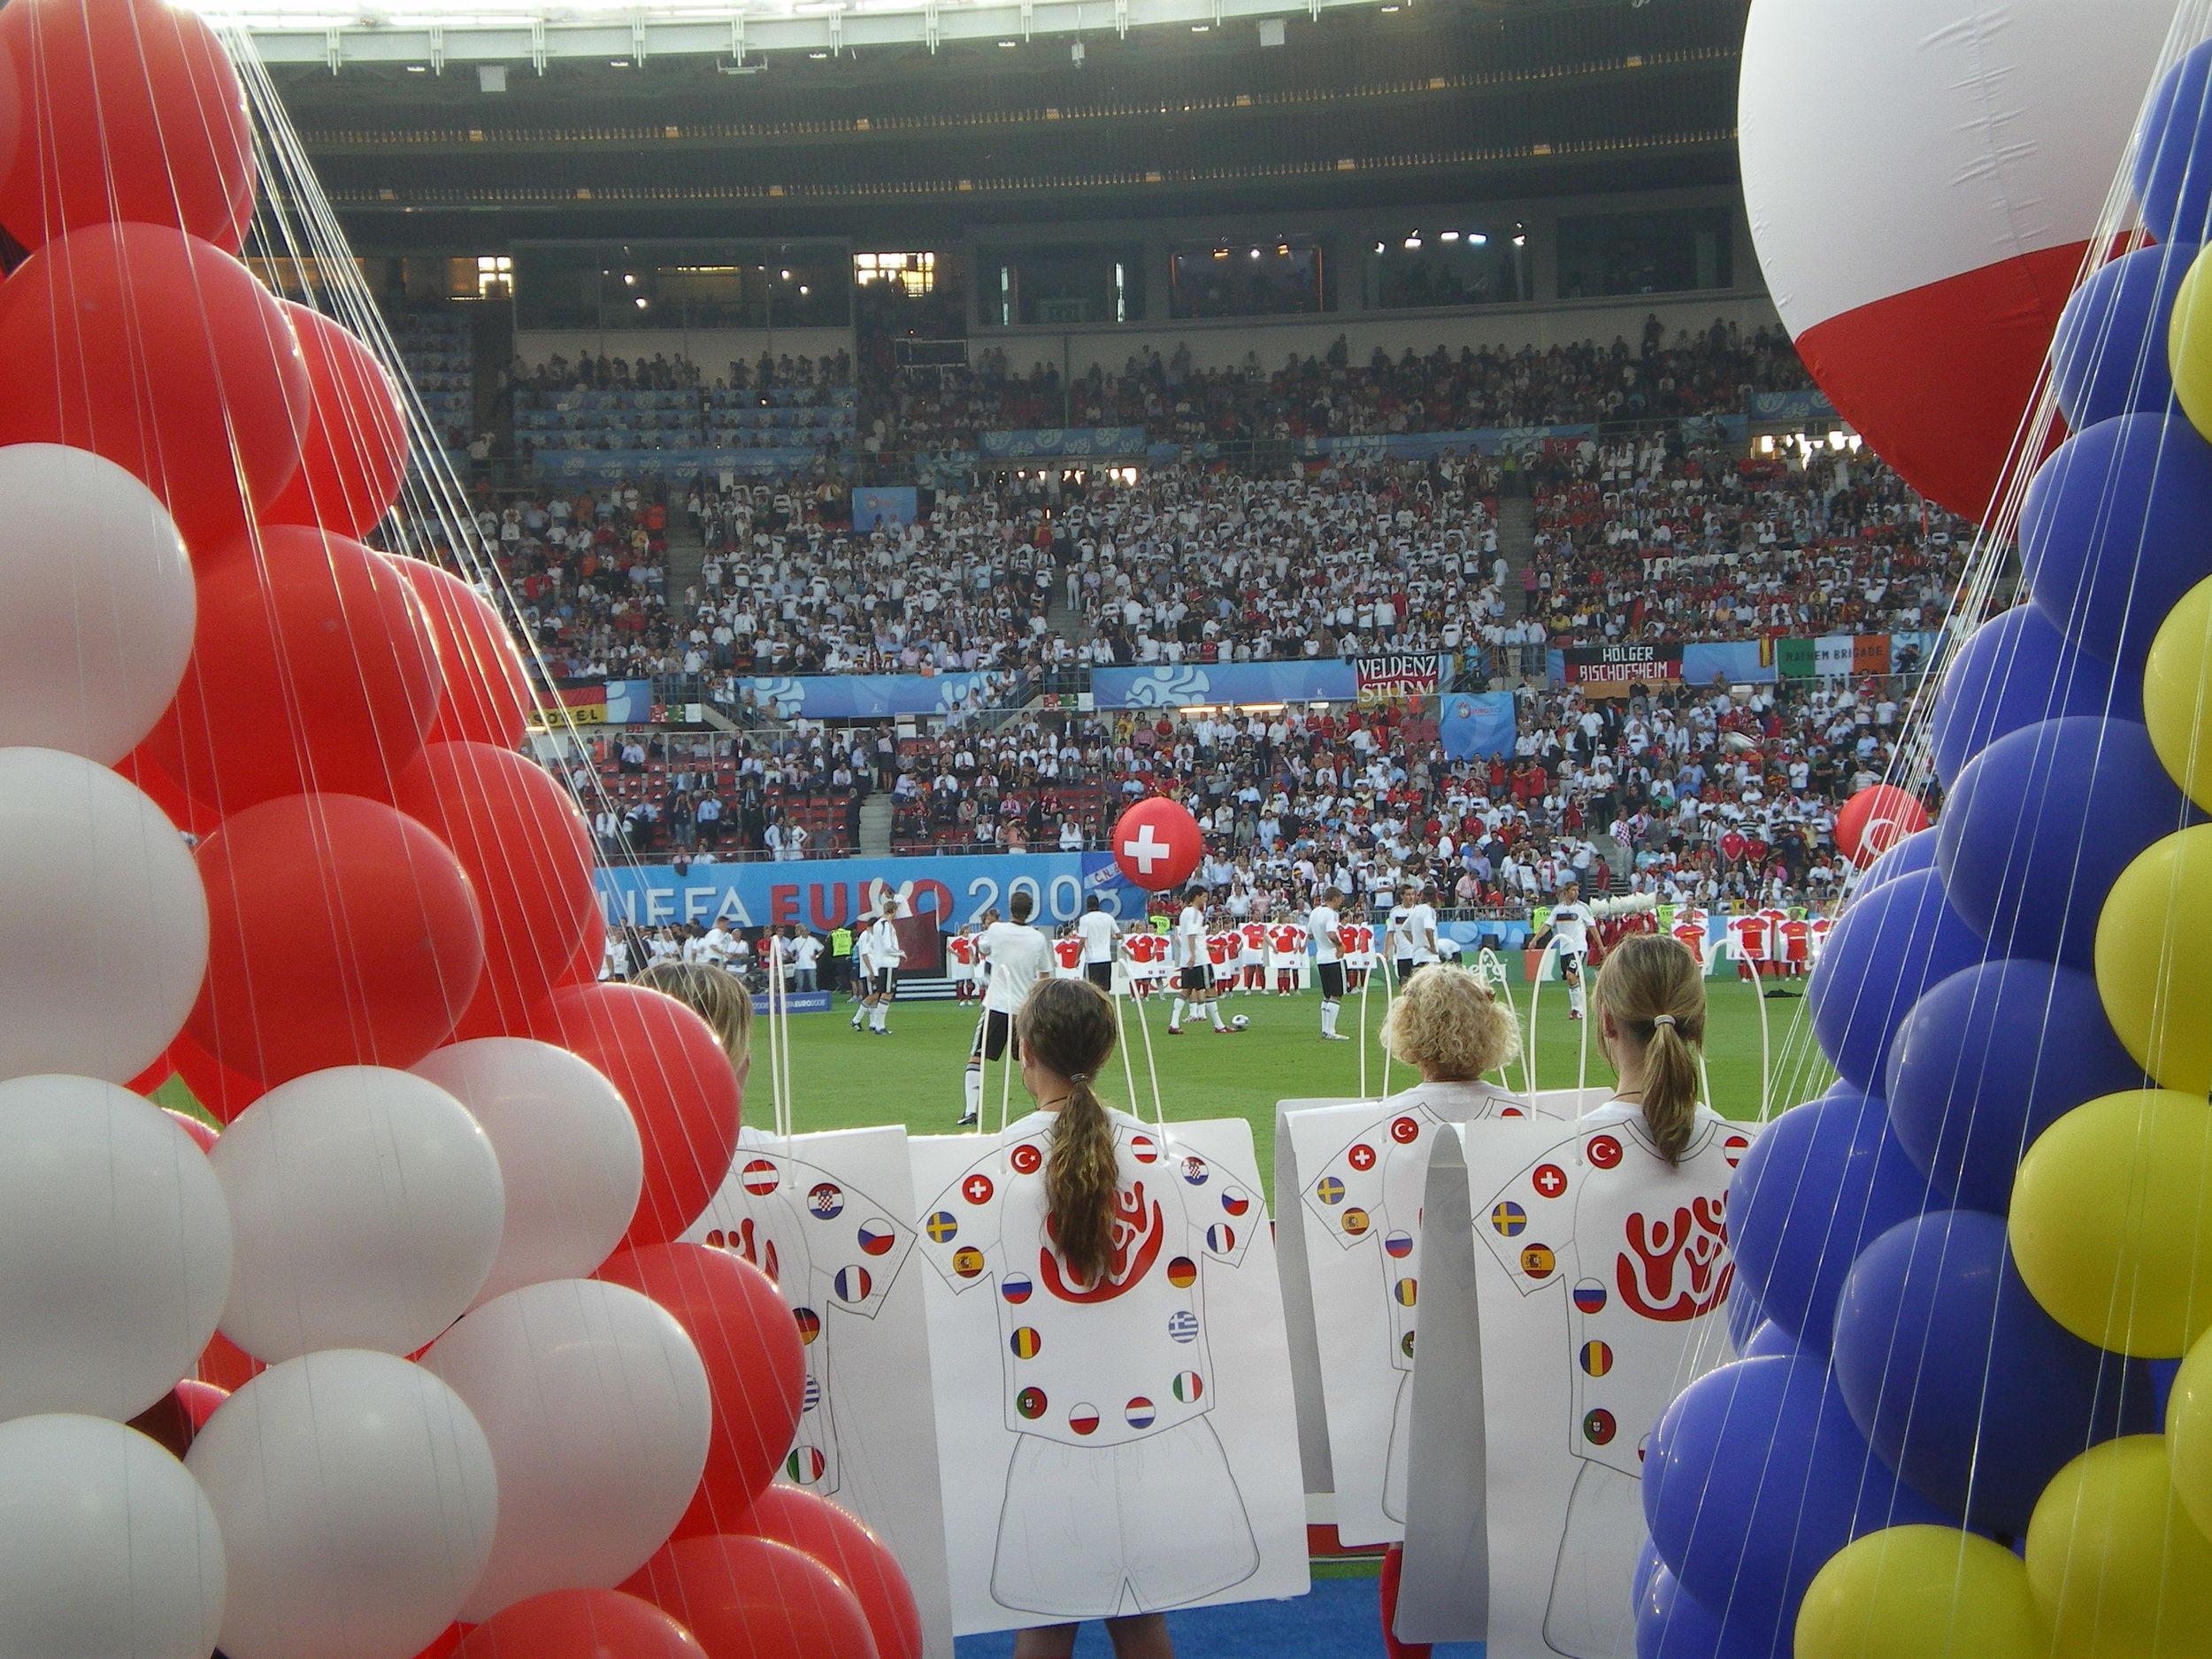 EM 2008 Finale 213.jpg